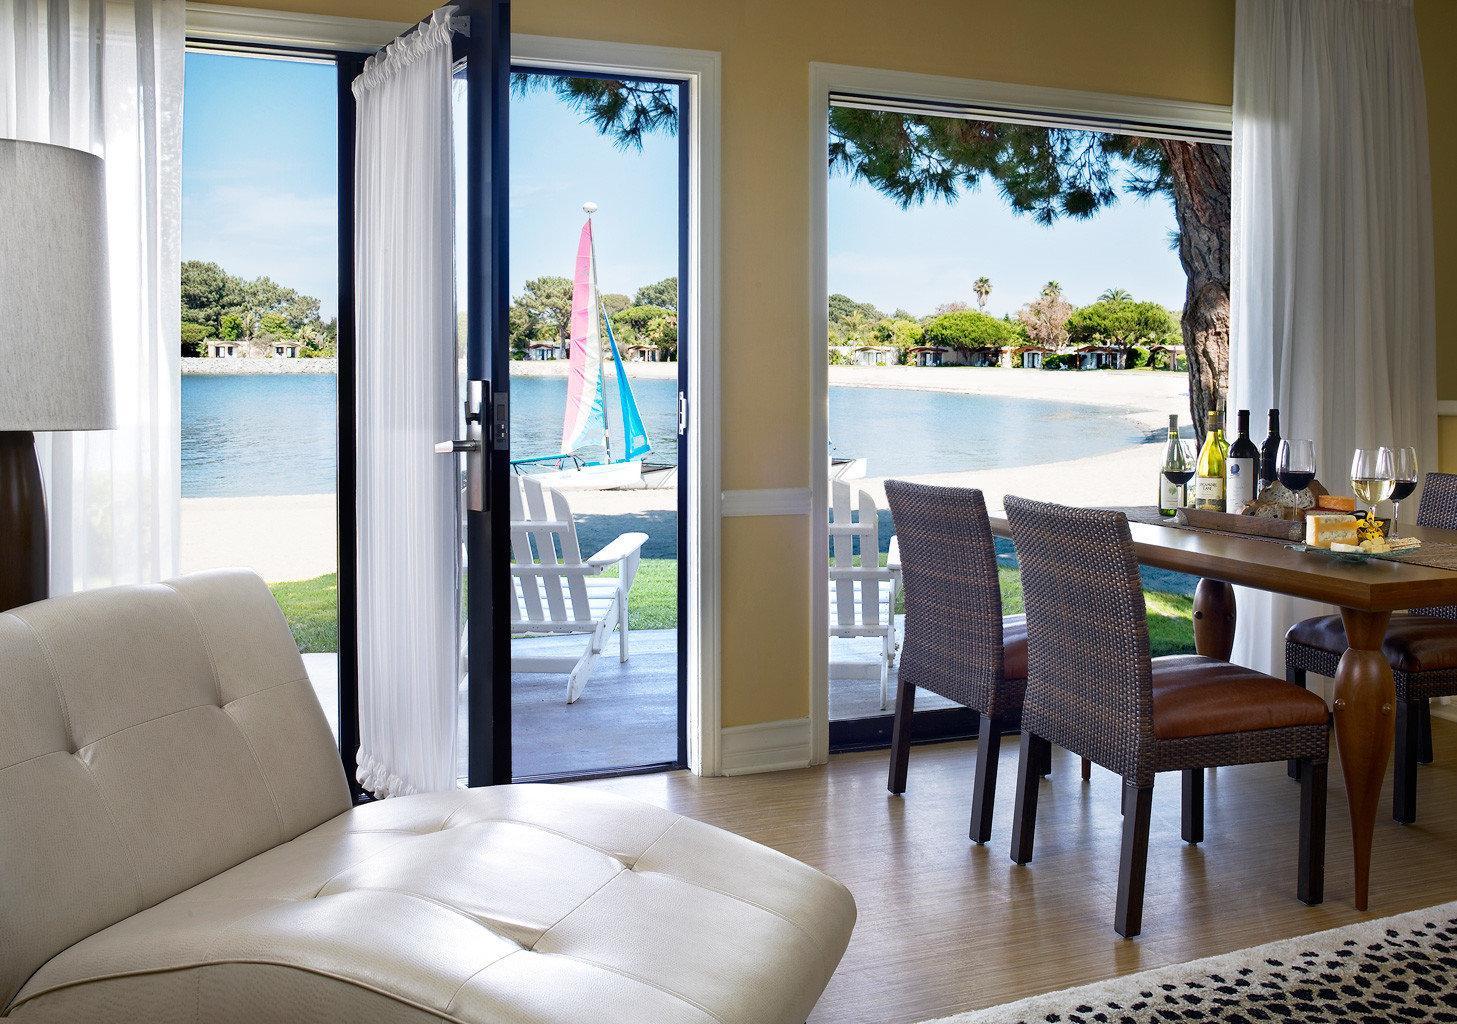 Beachfront Boat Ocean Patio Resort Terrace property home living room condominium cottage porch Villa Suite